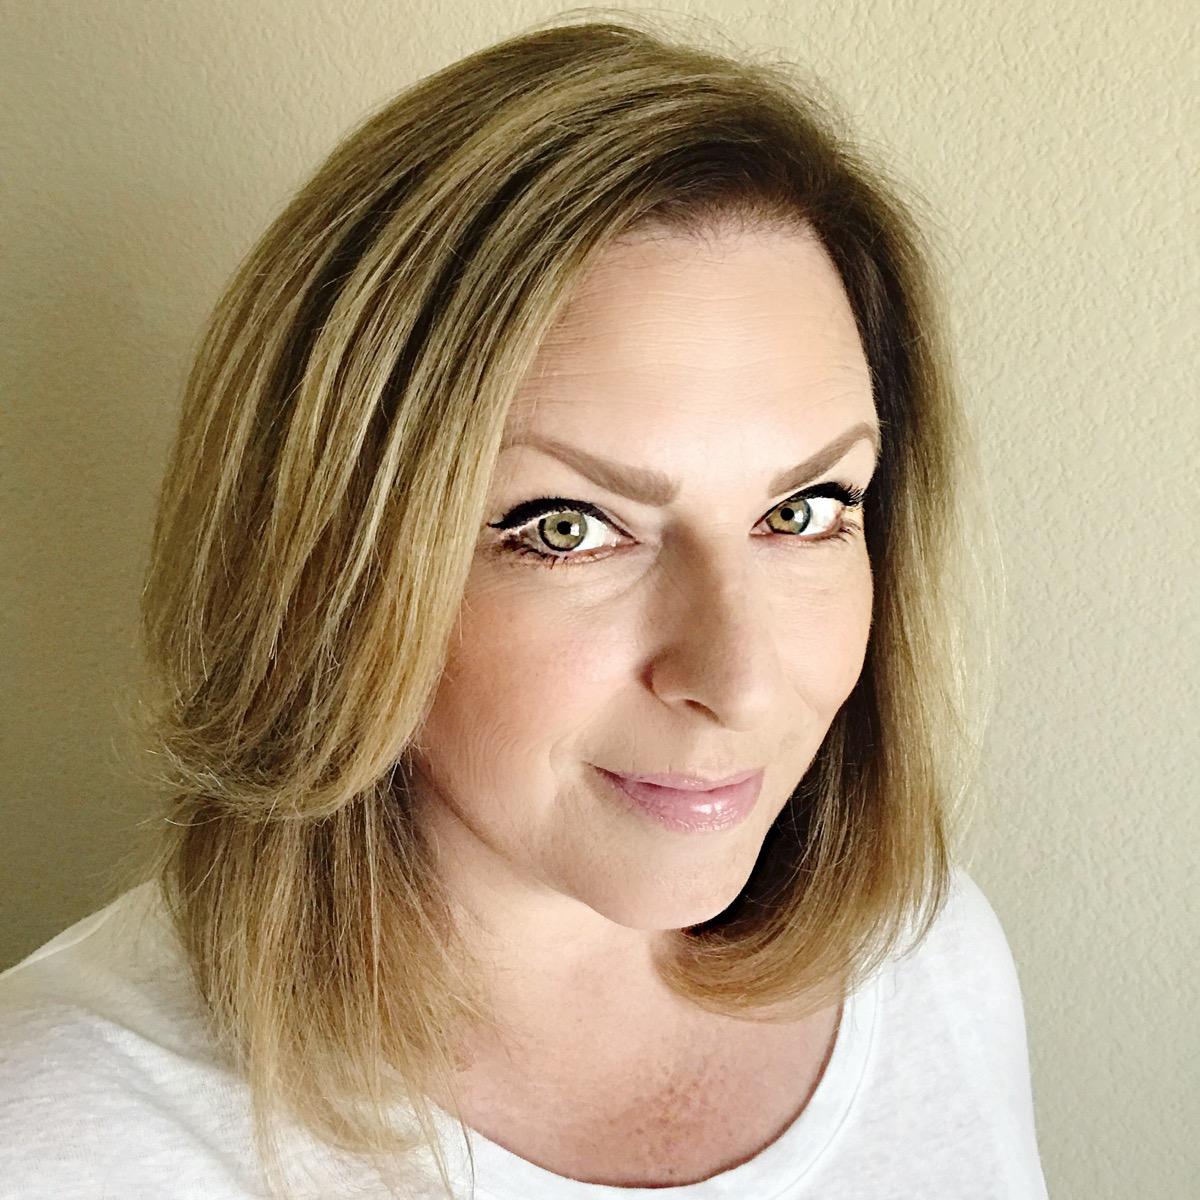 Barbara Picinich